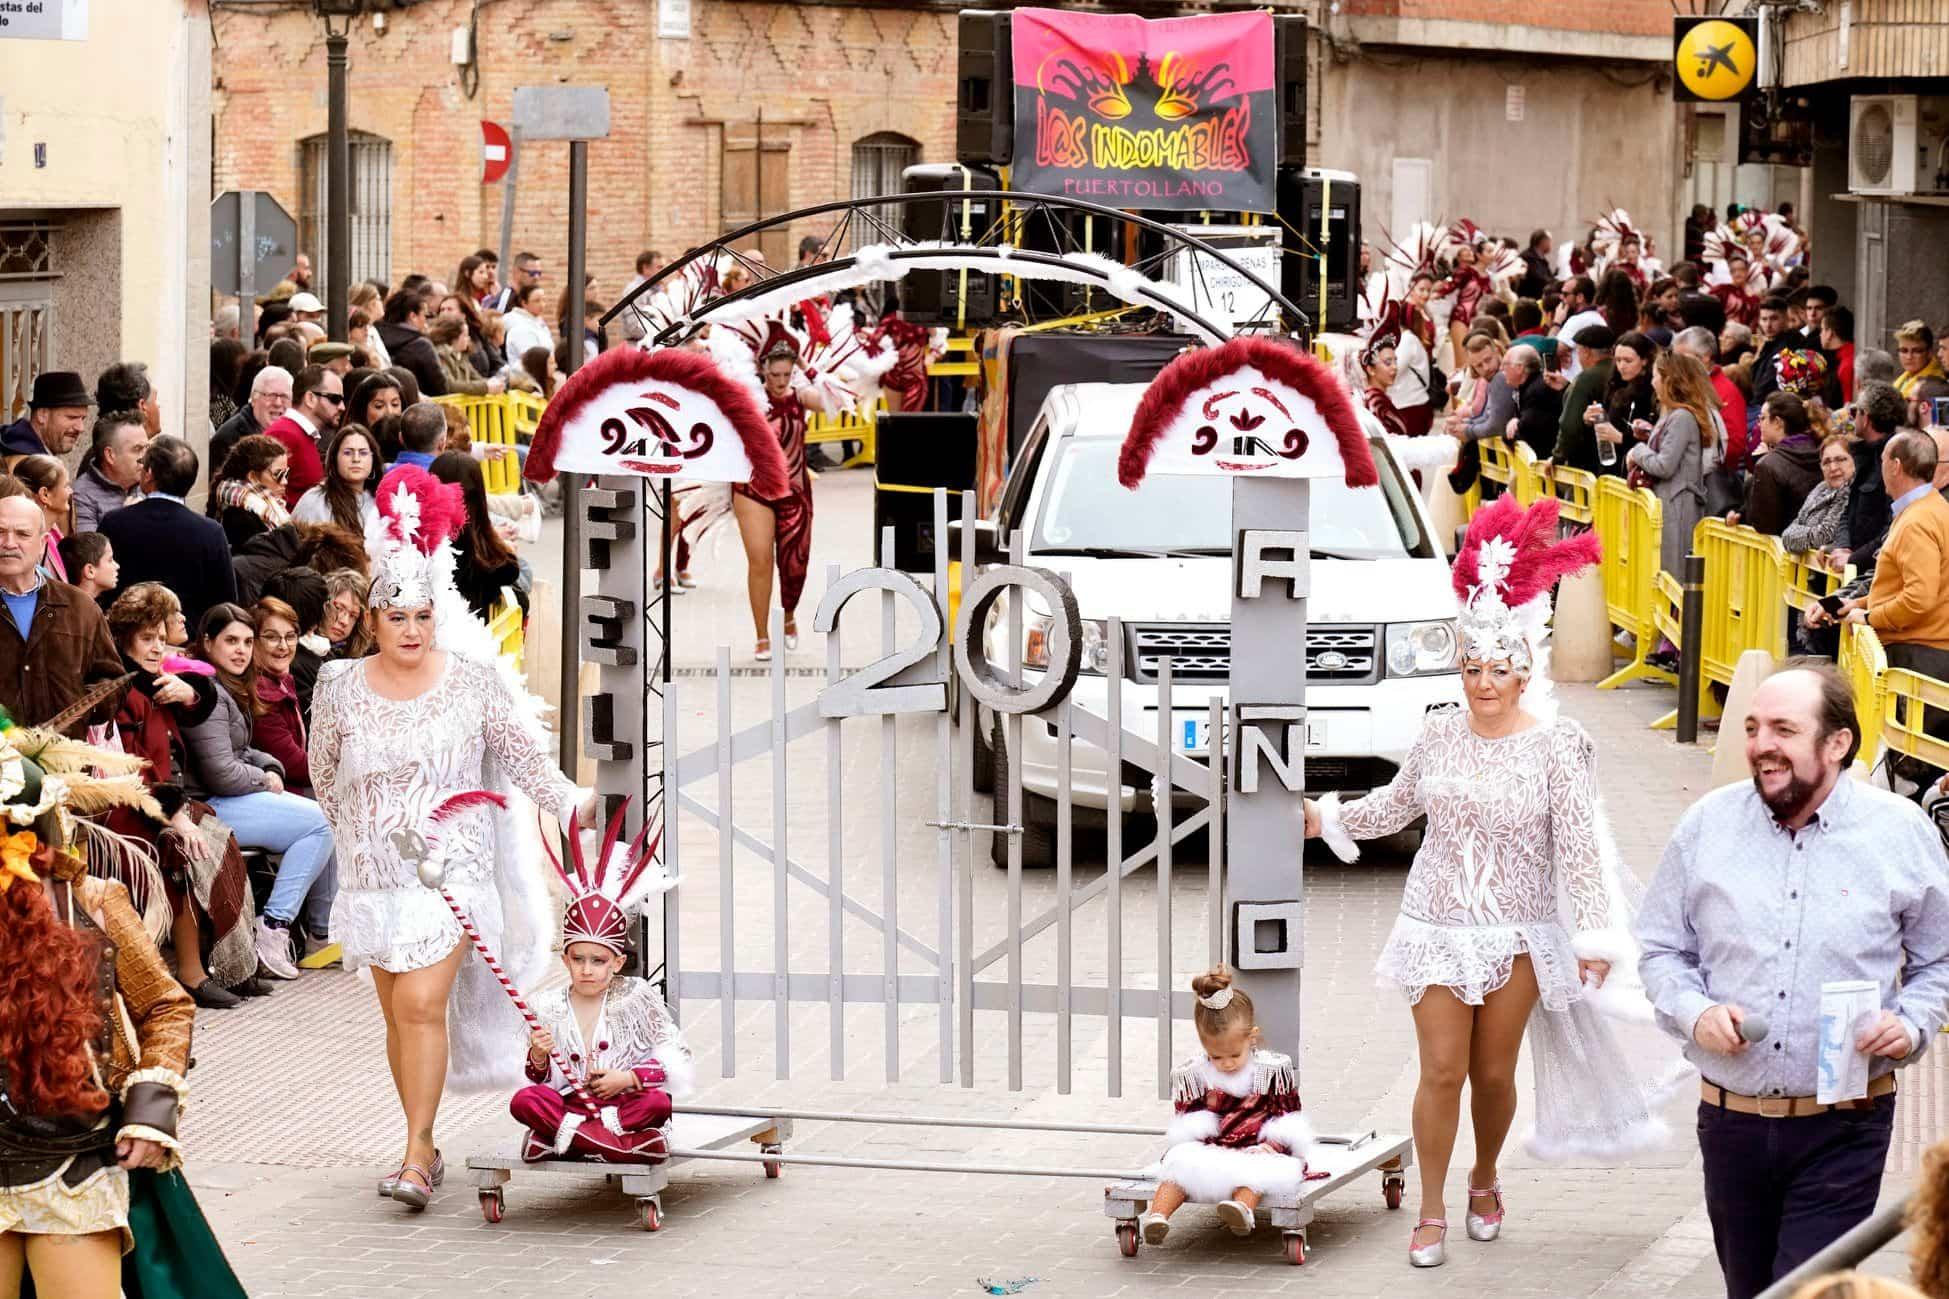 Carnaval de herencia 2020 ofertorio 60 - Selección de fotografías del Ofertorio del Carnaval de Herencia